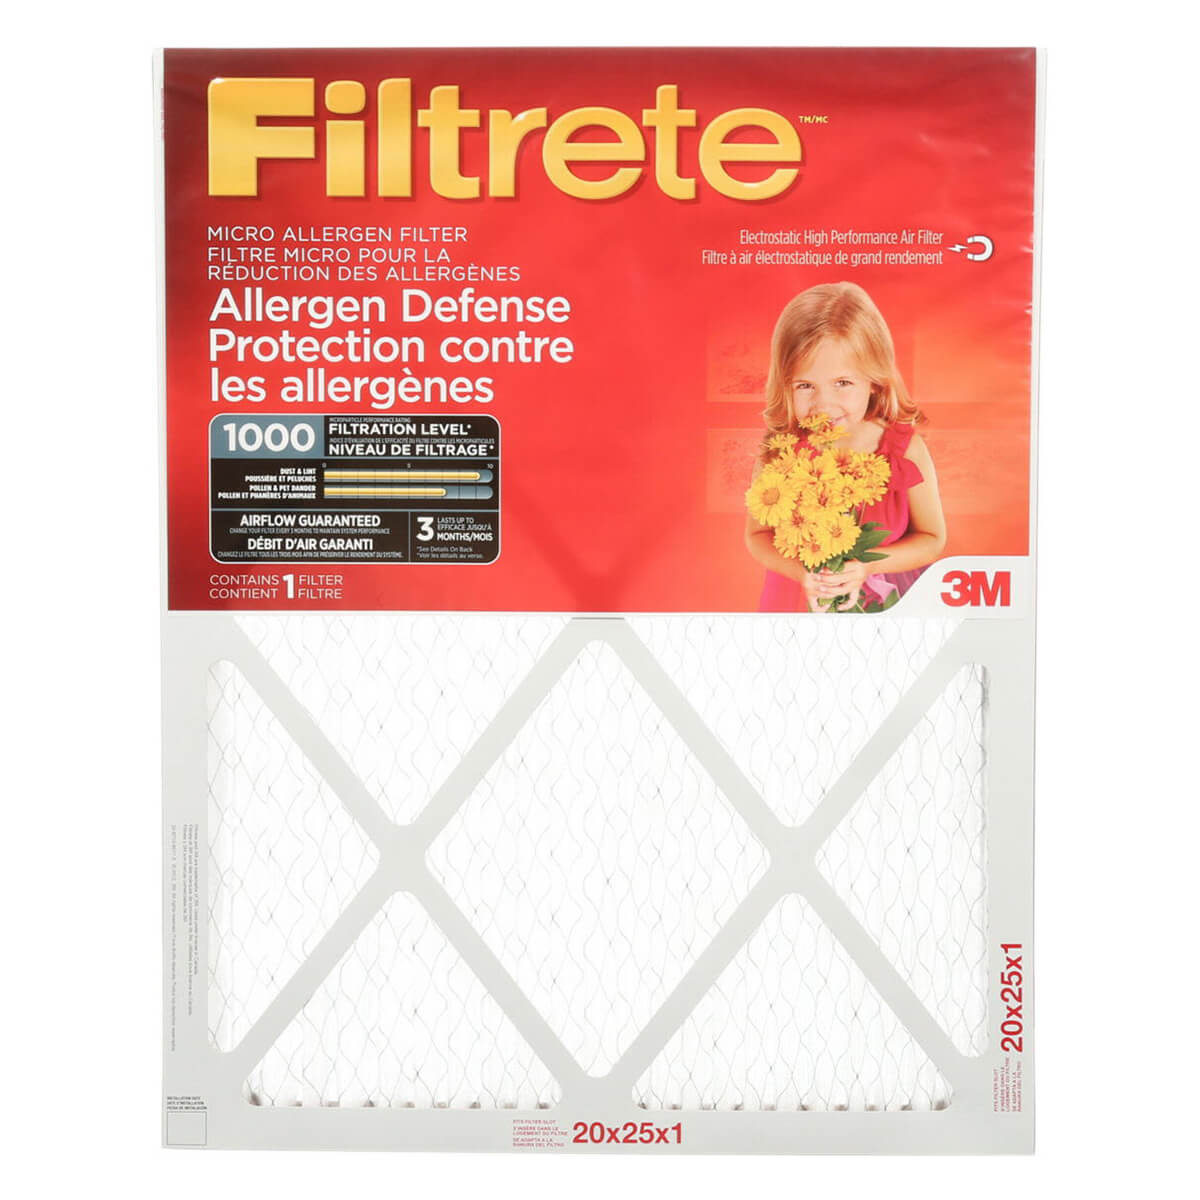 "16"" x 25"" x 1"" Filtrete™ Micro Allergen Defense Filter"